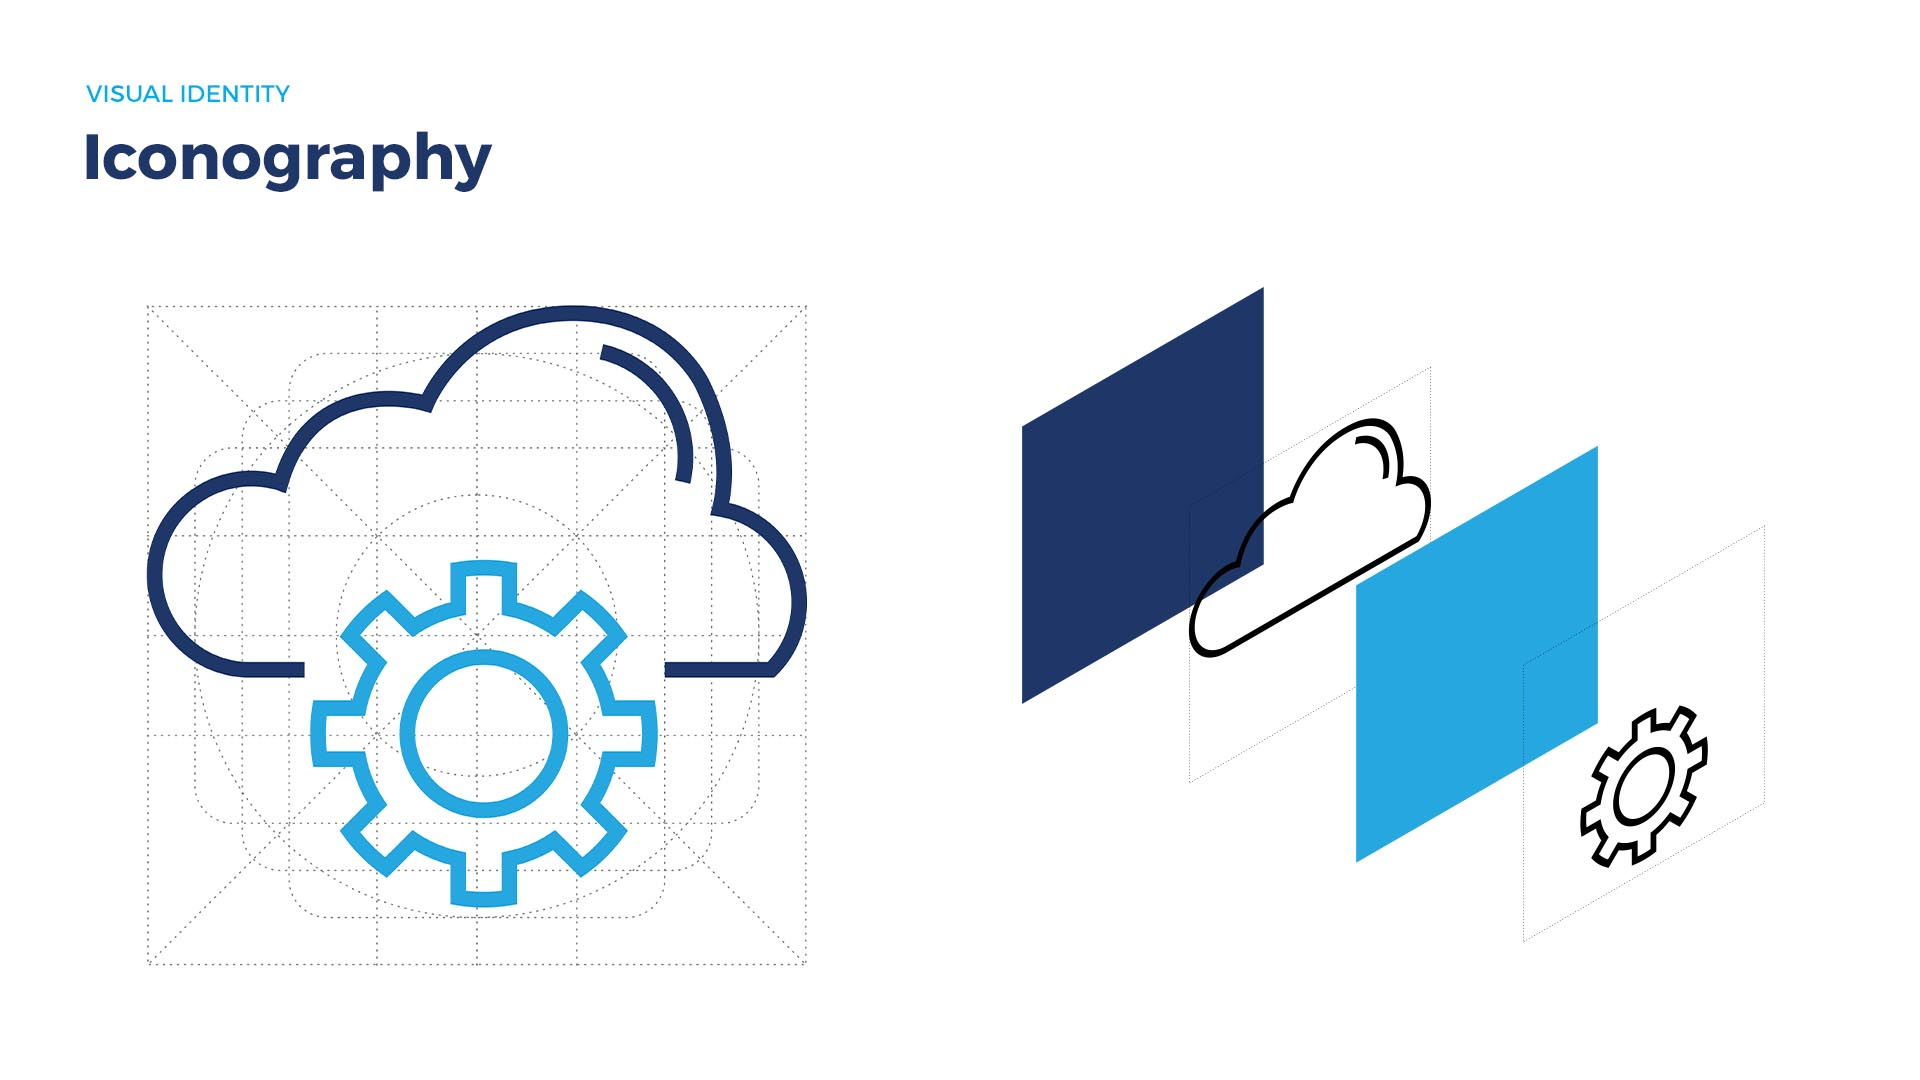 Cloud Go Iconography